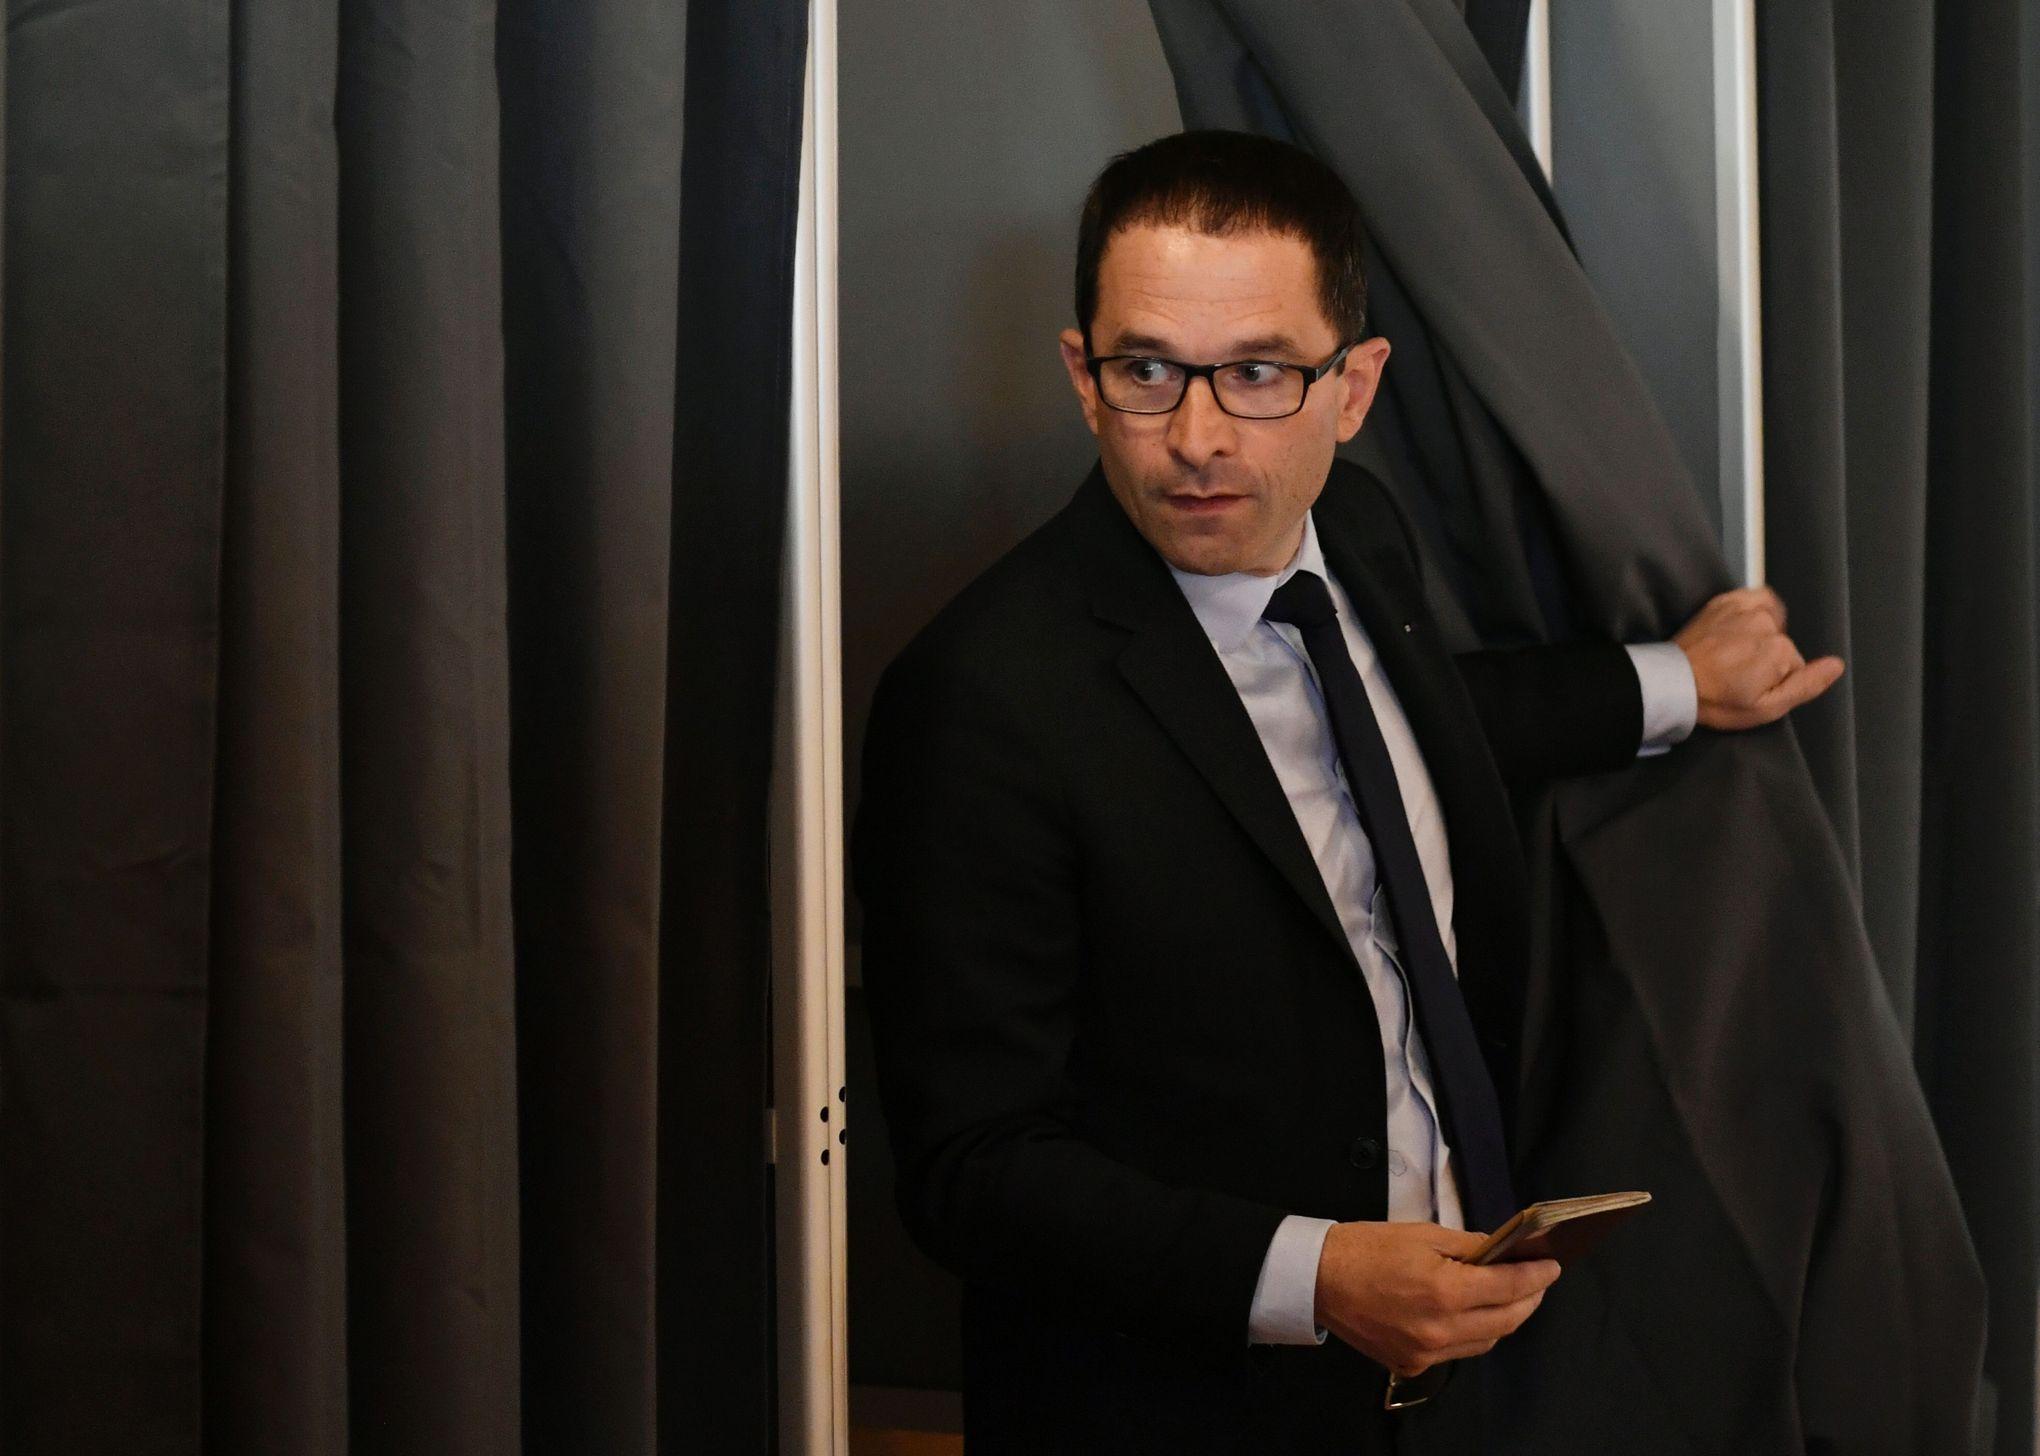 Benoît Hamon, autopsie d'un échec programmé